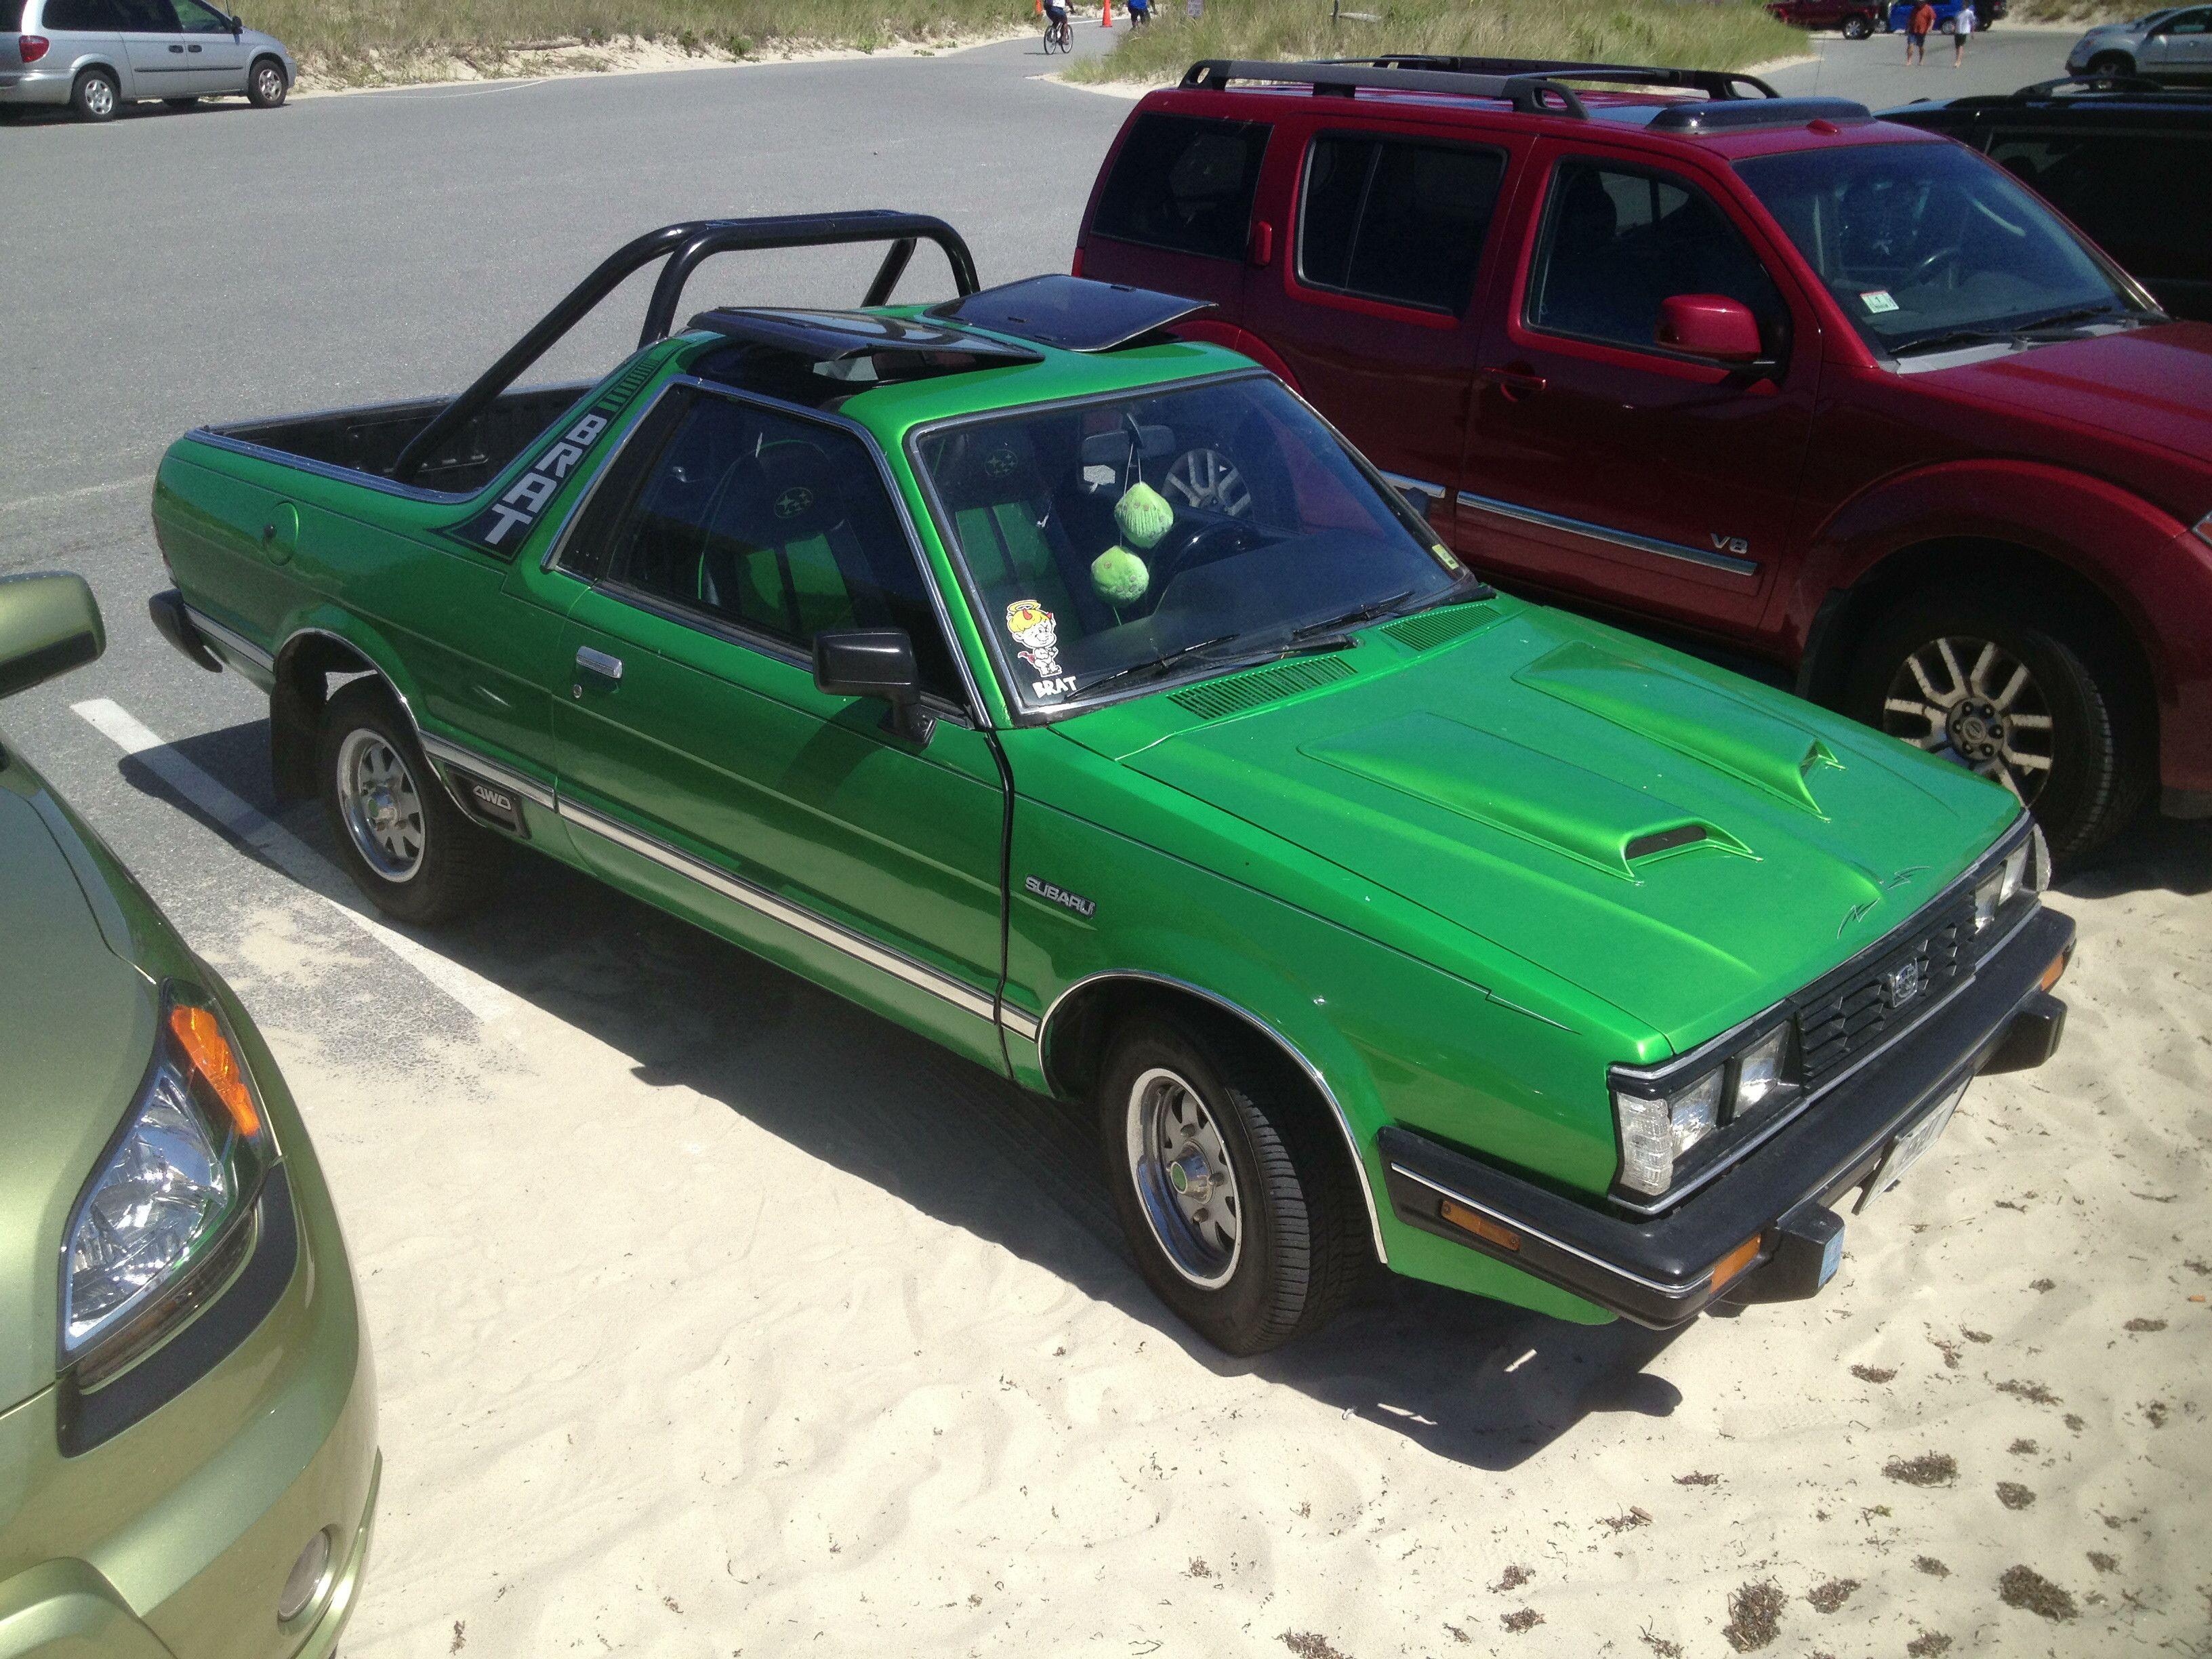 Fully restored Subaru BRAT I spotted last summer on Cape Cod